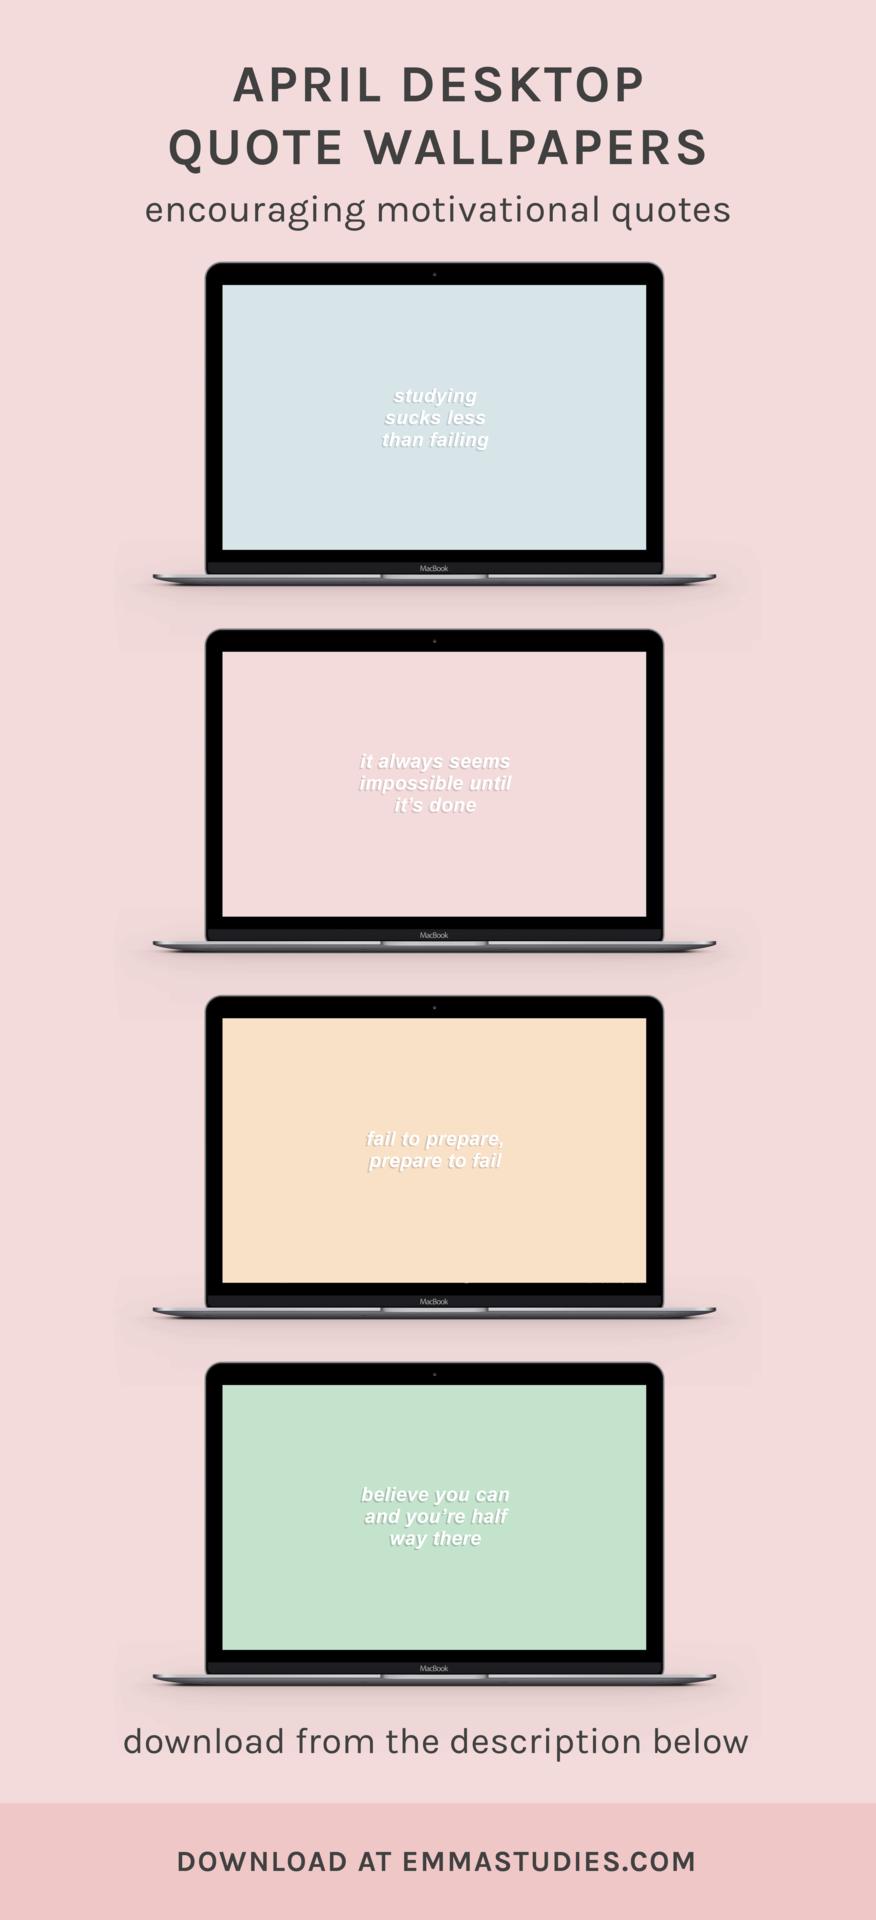 Emma S Studyblr Motivational Wallpaper Study Laptop Motivation Study Motivation